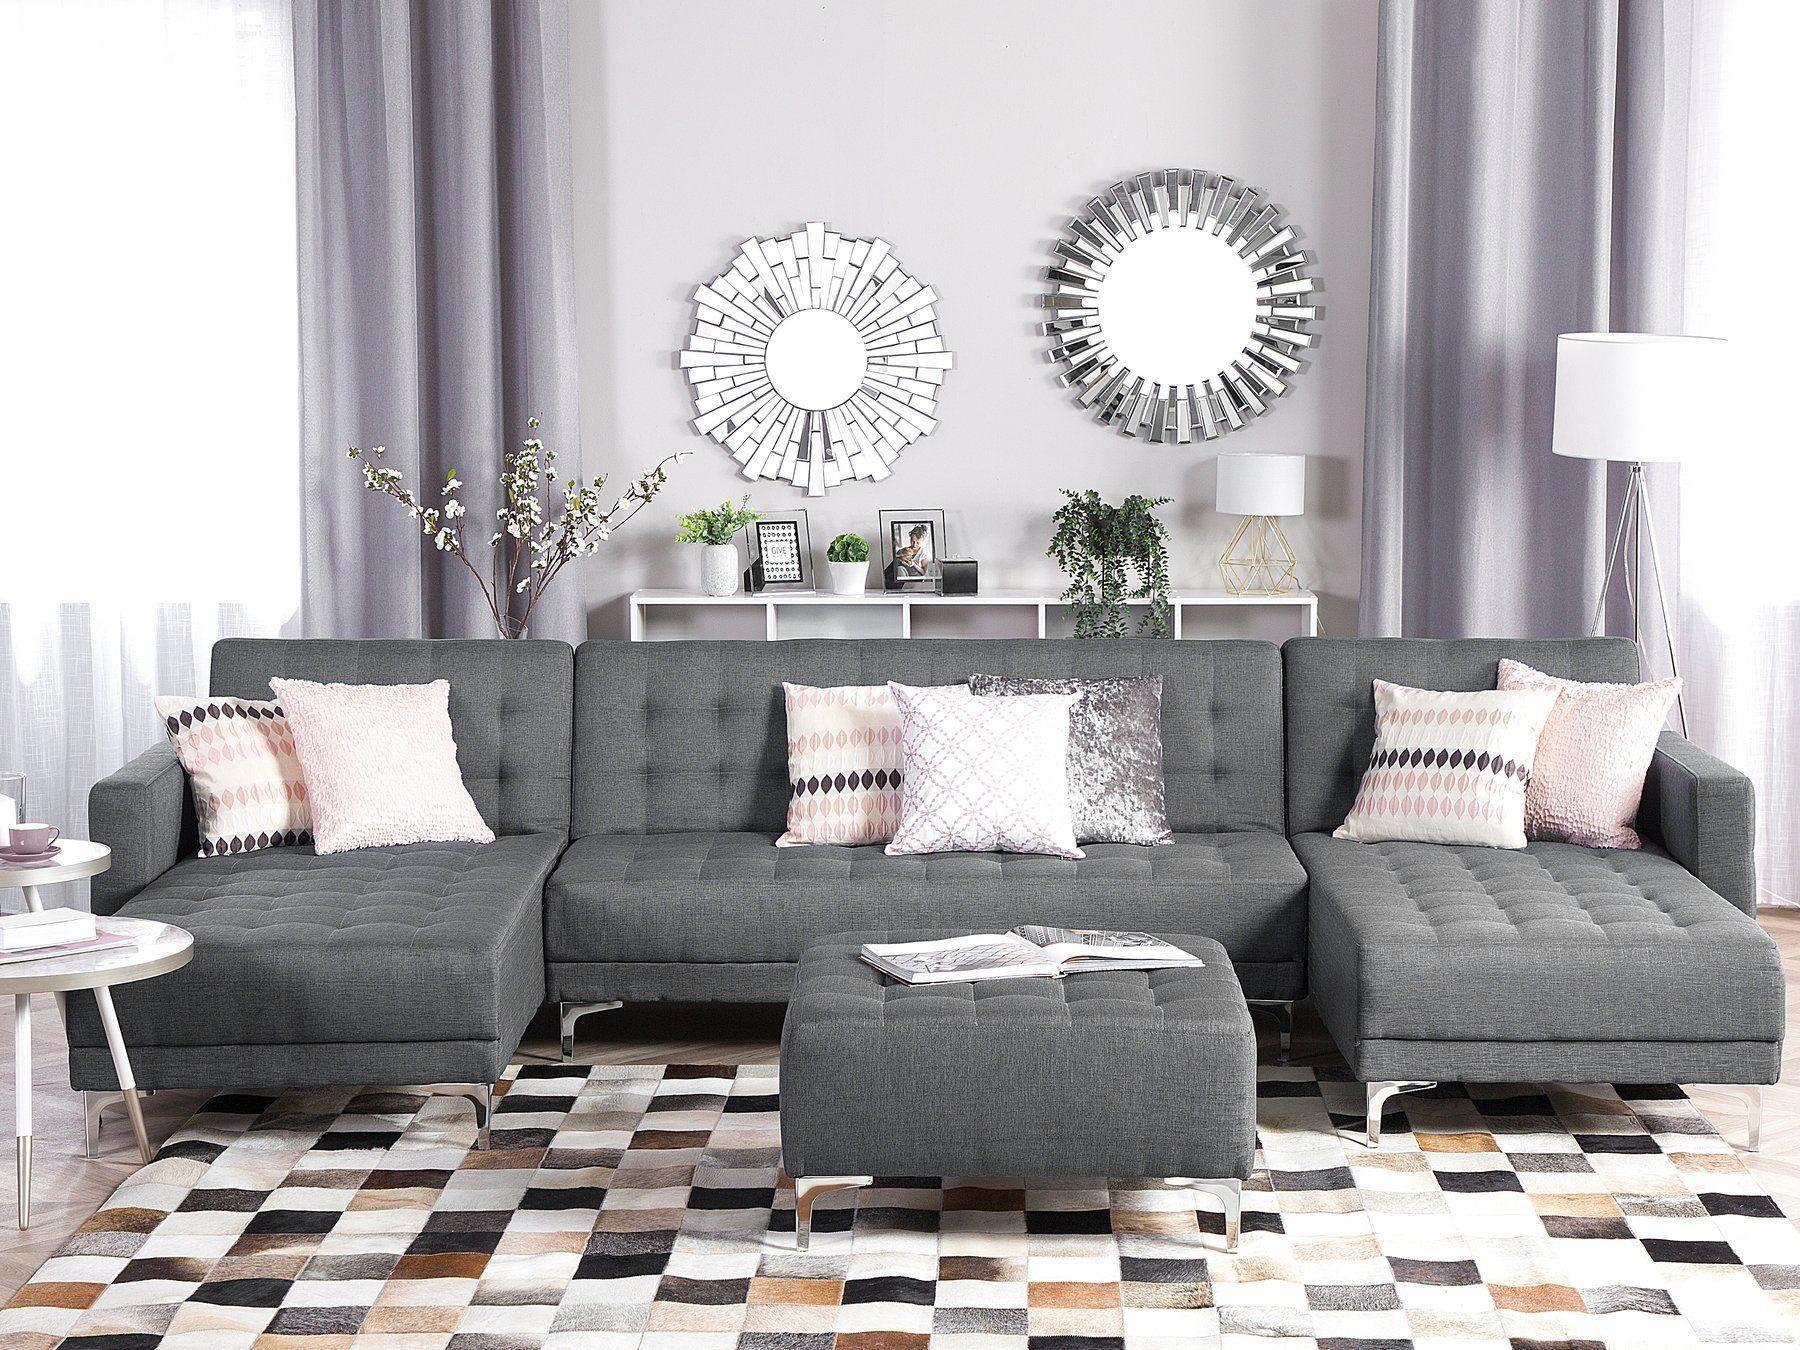 5 Seater U Shaped Modular Fabric Sofa With Ottoman Grey Aberdeen Beliani Pt Modular Corner Sofa Corner Sofa Modern Sectional Living Room